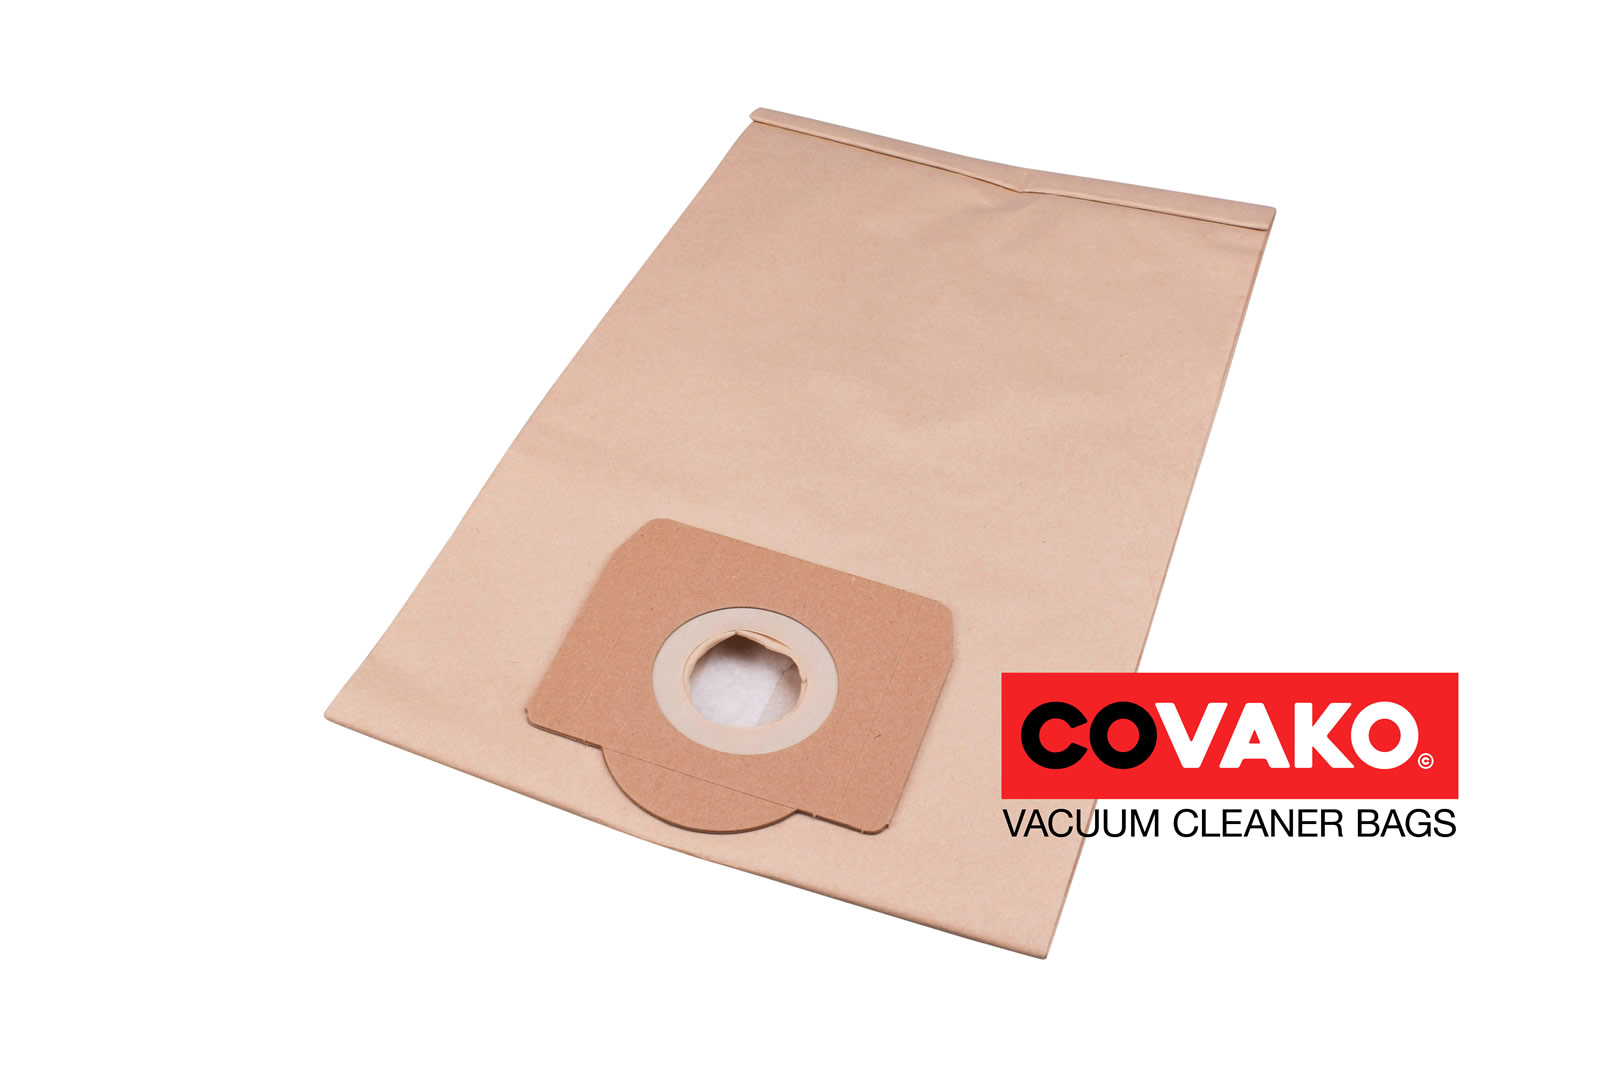 DiBo Windly 515 Inox IPC / Papier - DiBo sacs d'aspirateur